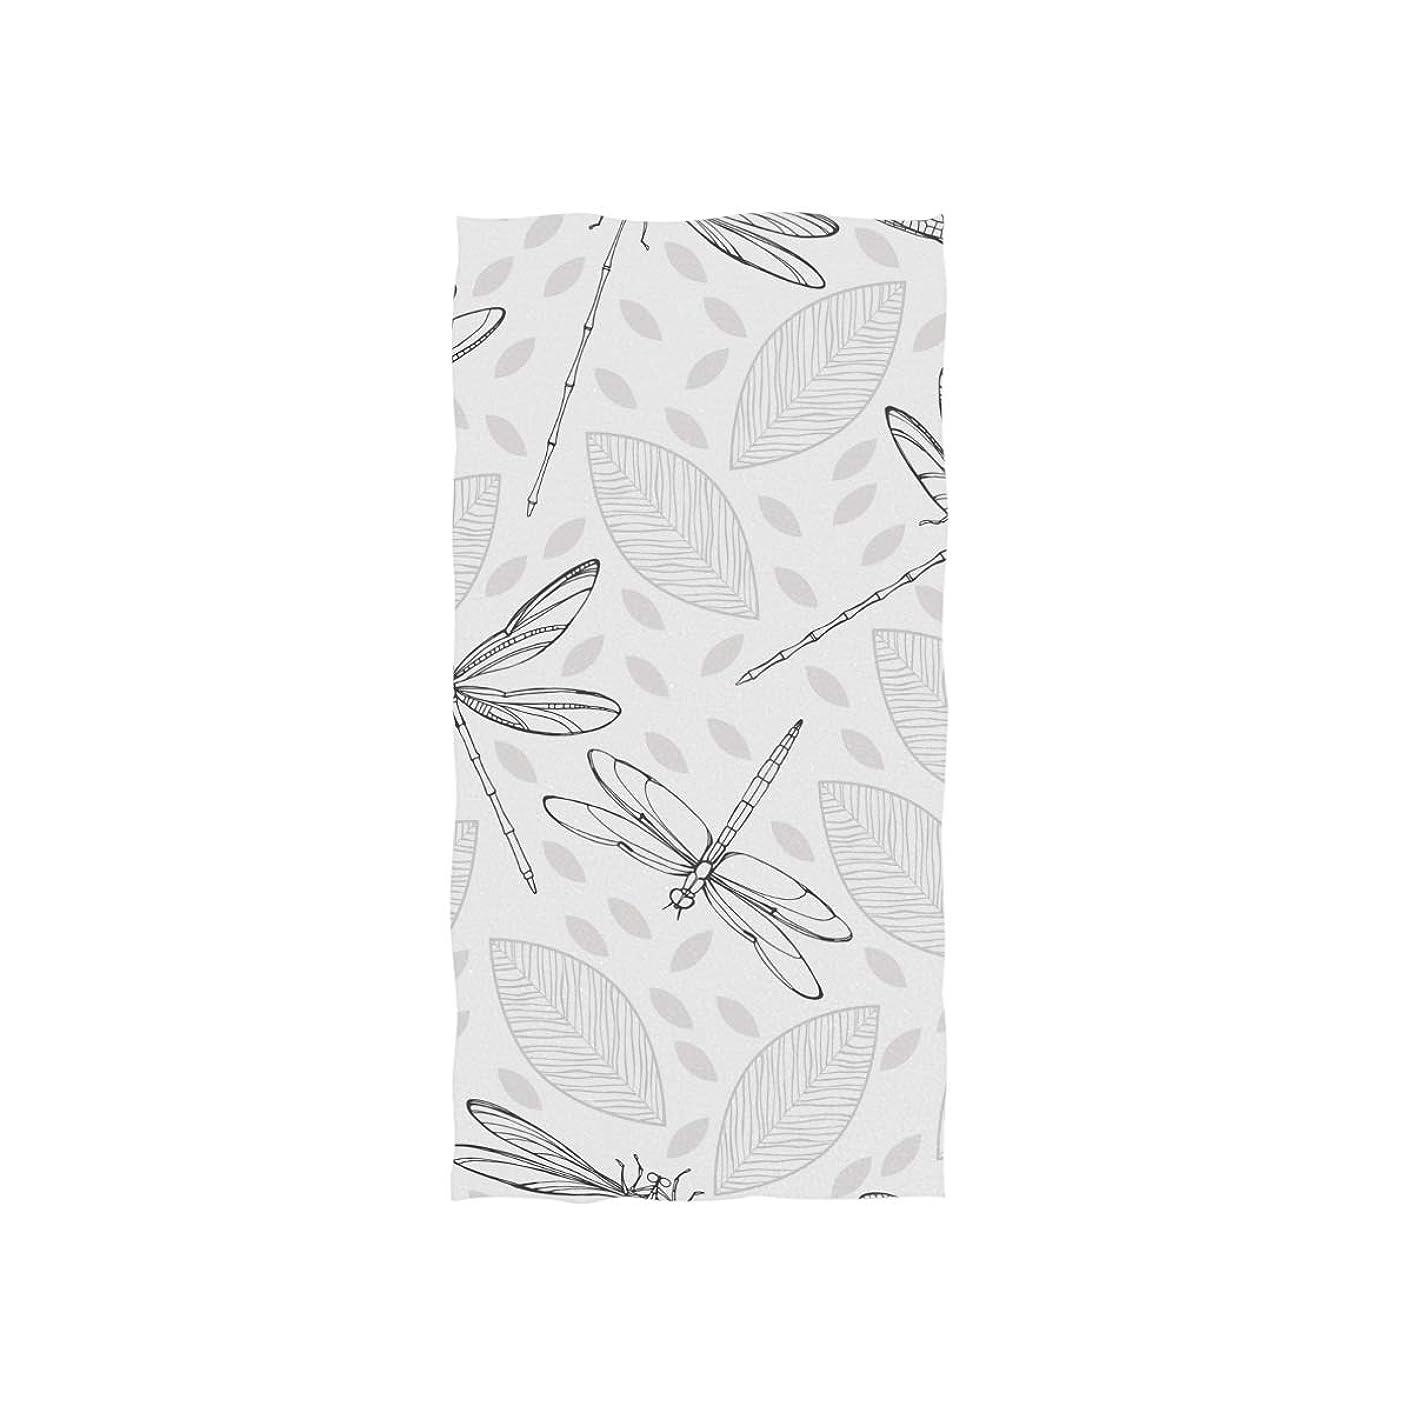 senya Dragonflies and Leaves Hand Towel Ultra Soft Luxury Towels for Bathroom 30